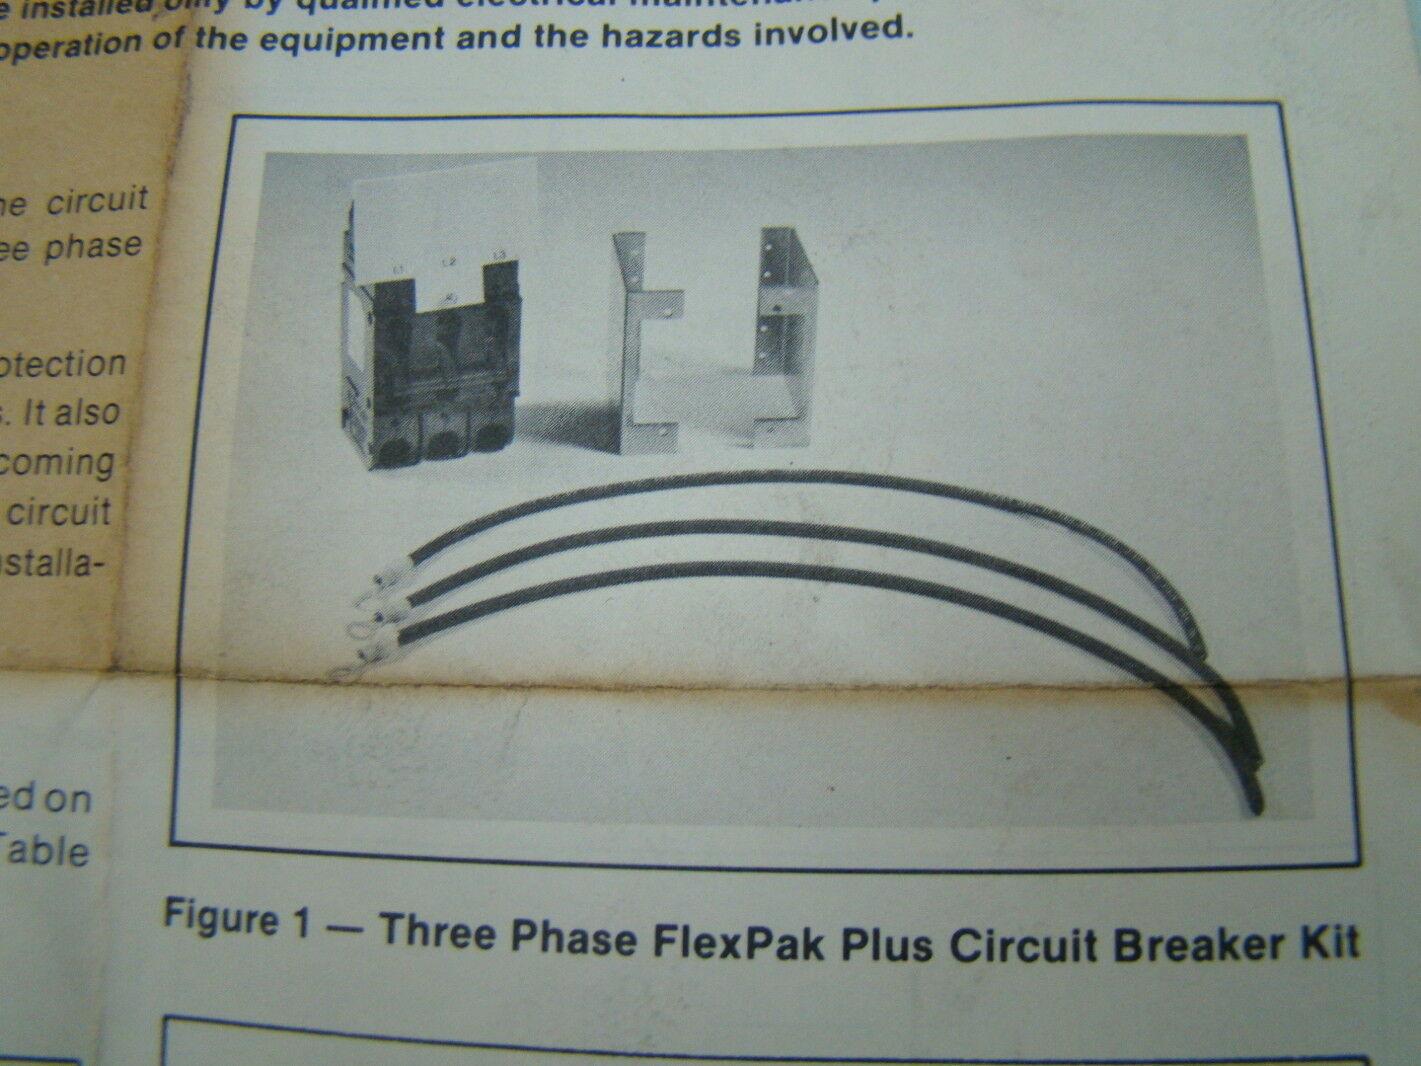 reliance 50 amp circuit breaker kit 705390 14c610